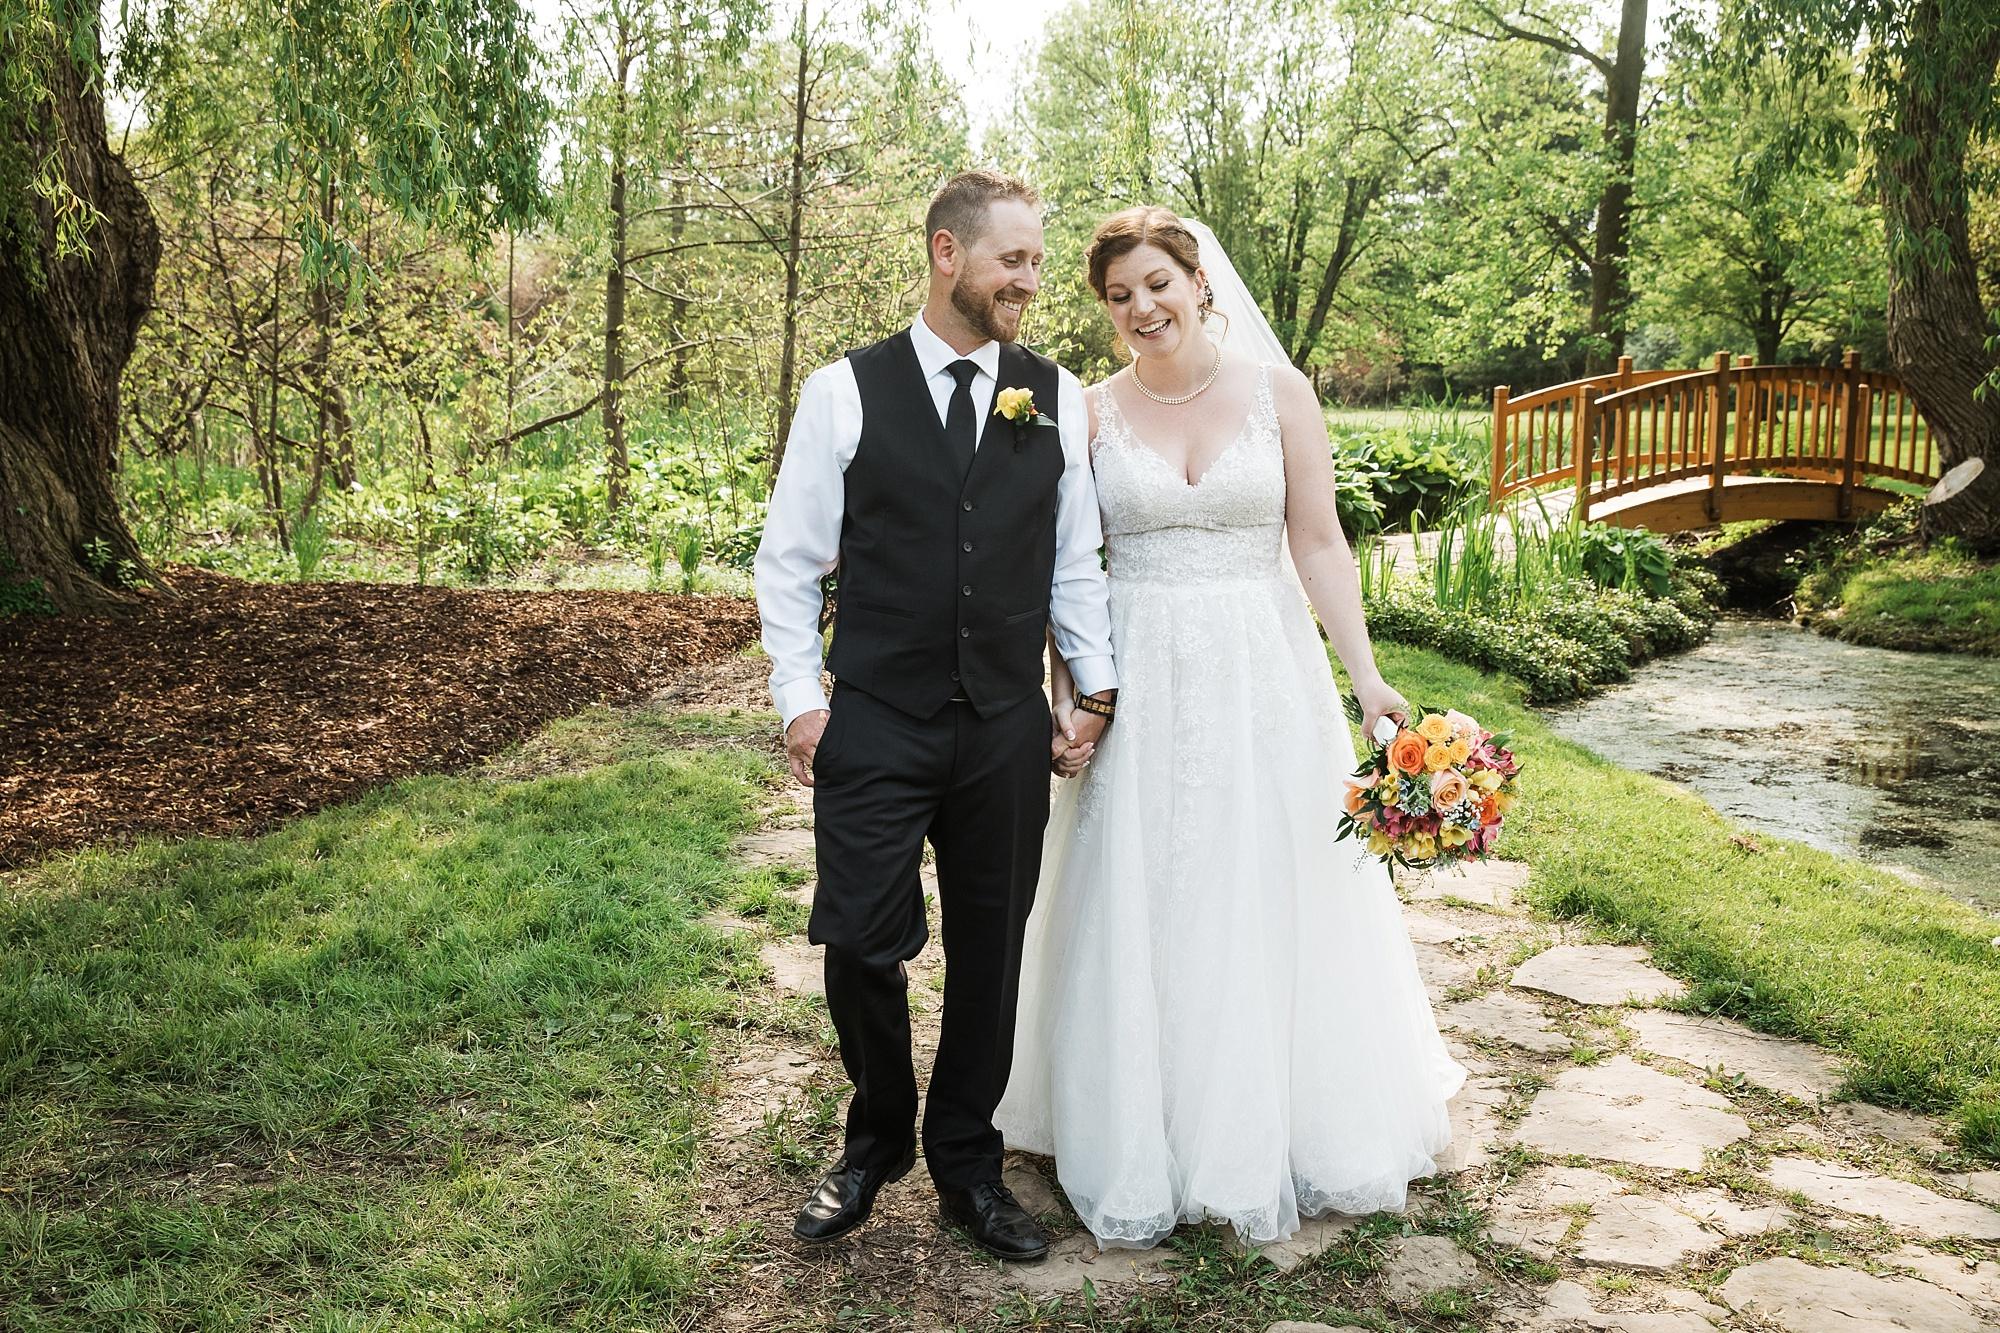 niagarafalls-weddingphotography_0029.jpg